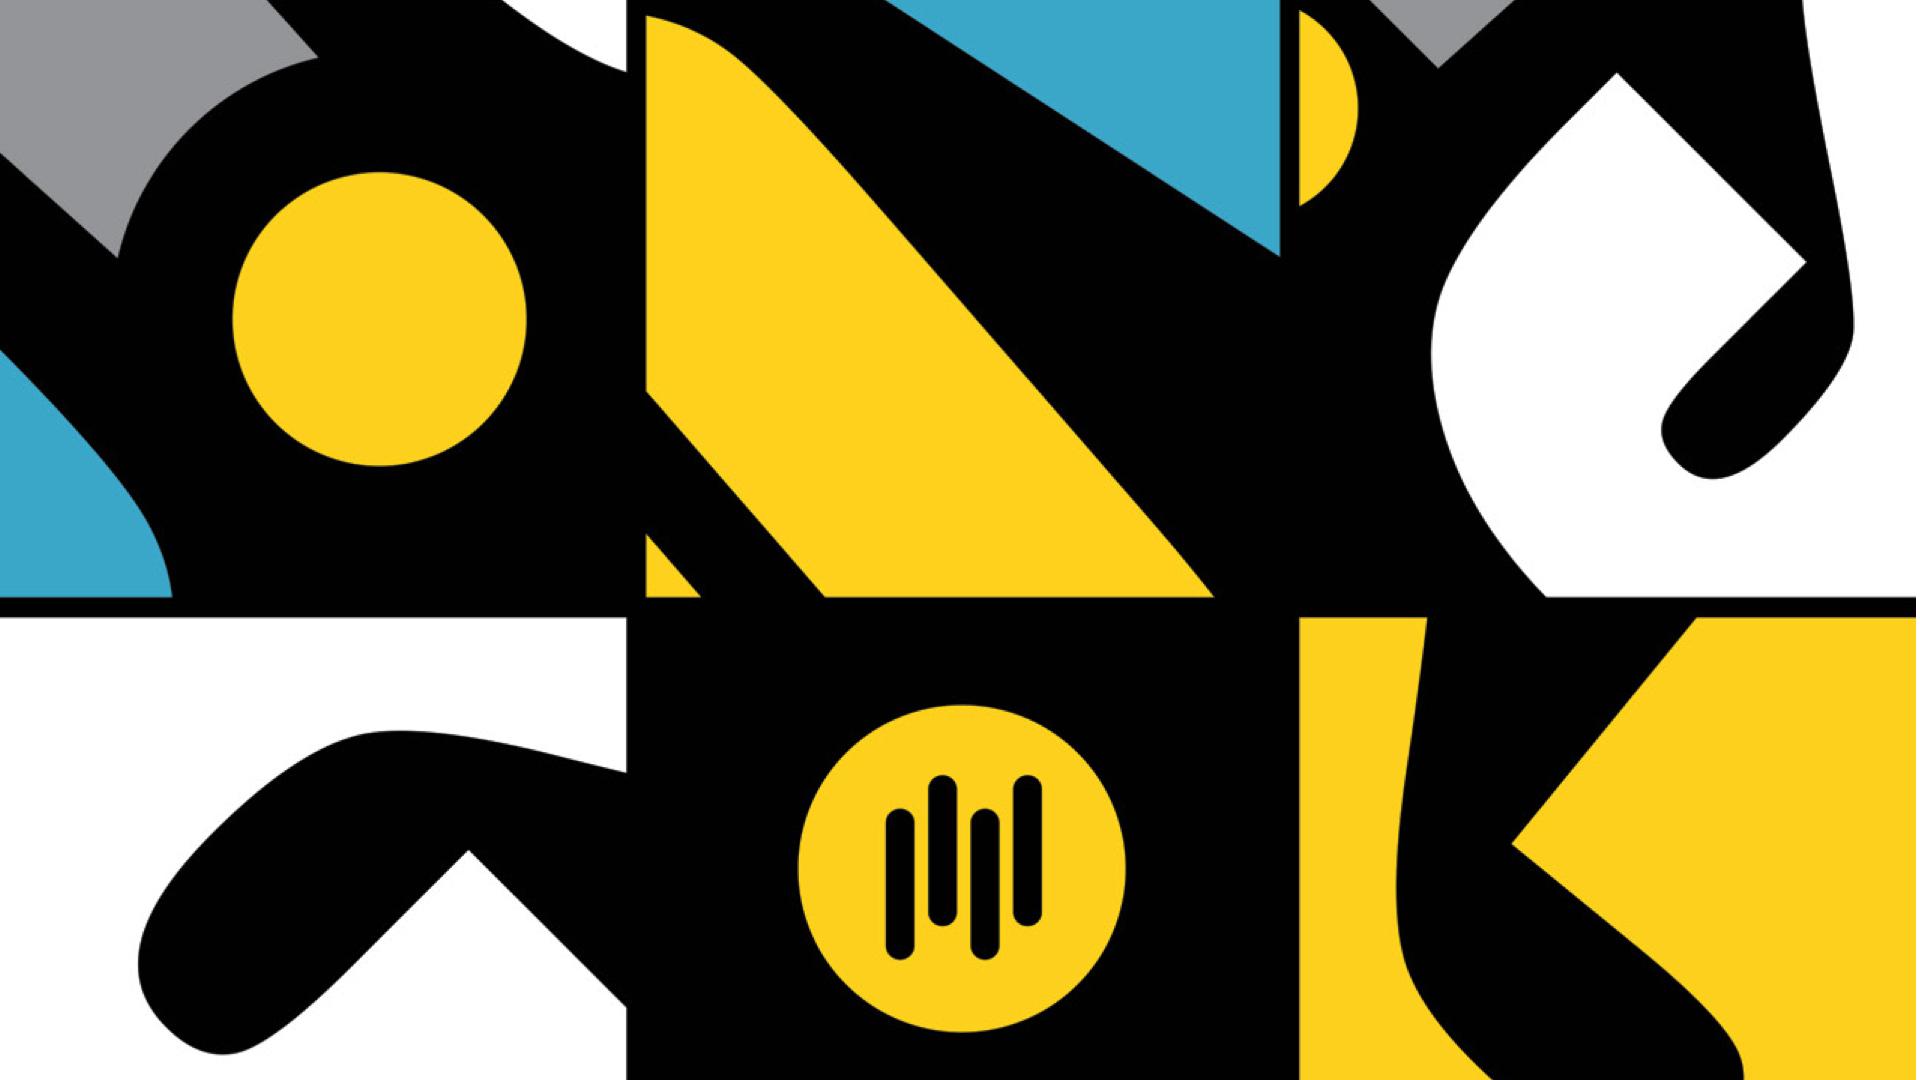 DYS! Identity Design + Deck Presentation - Created brand identity and theme.